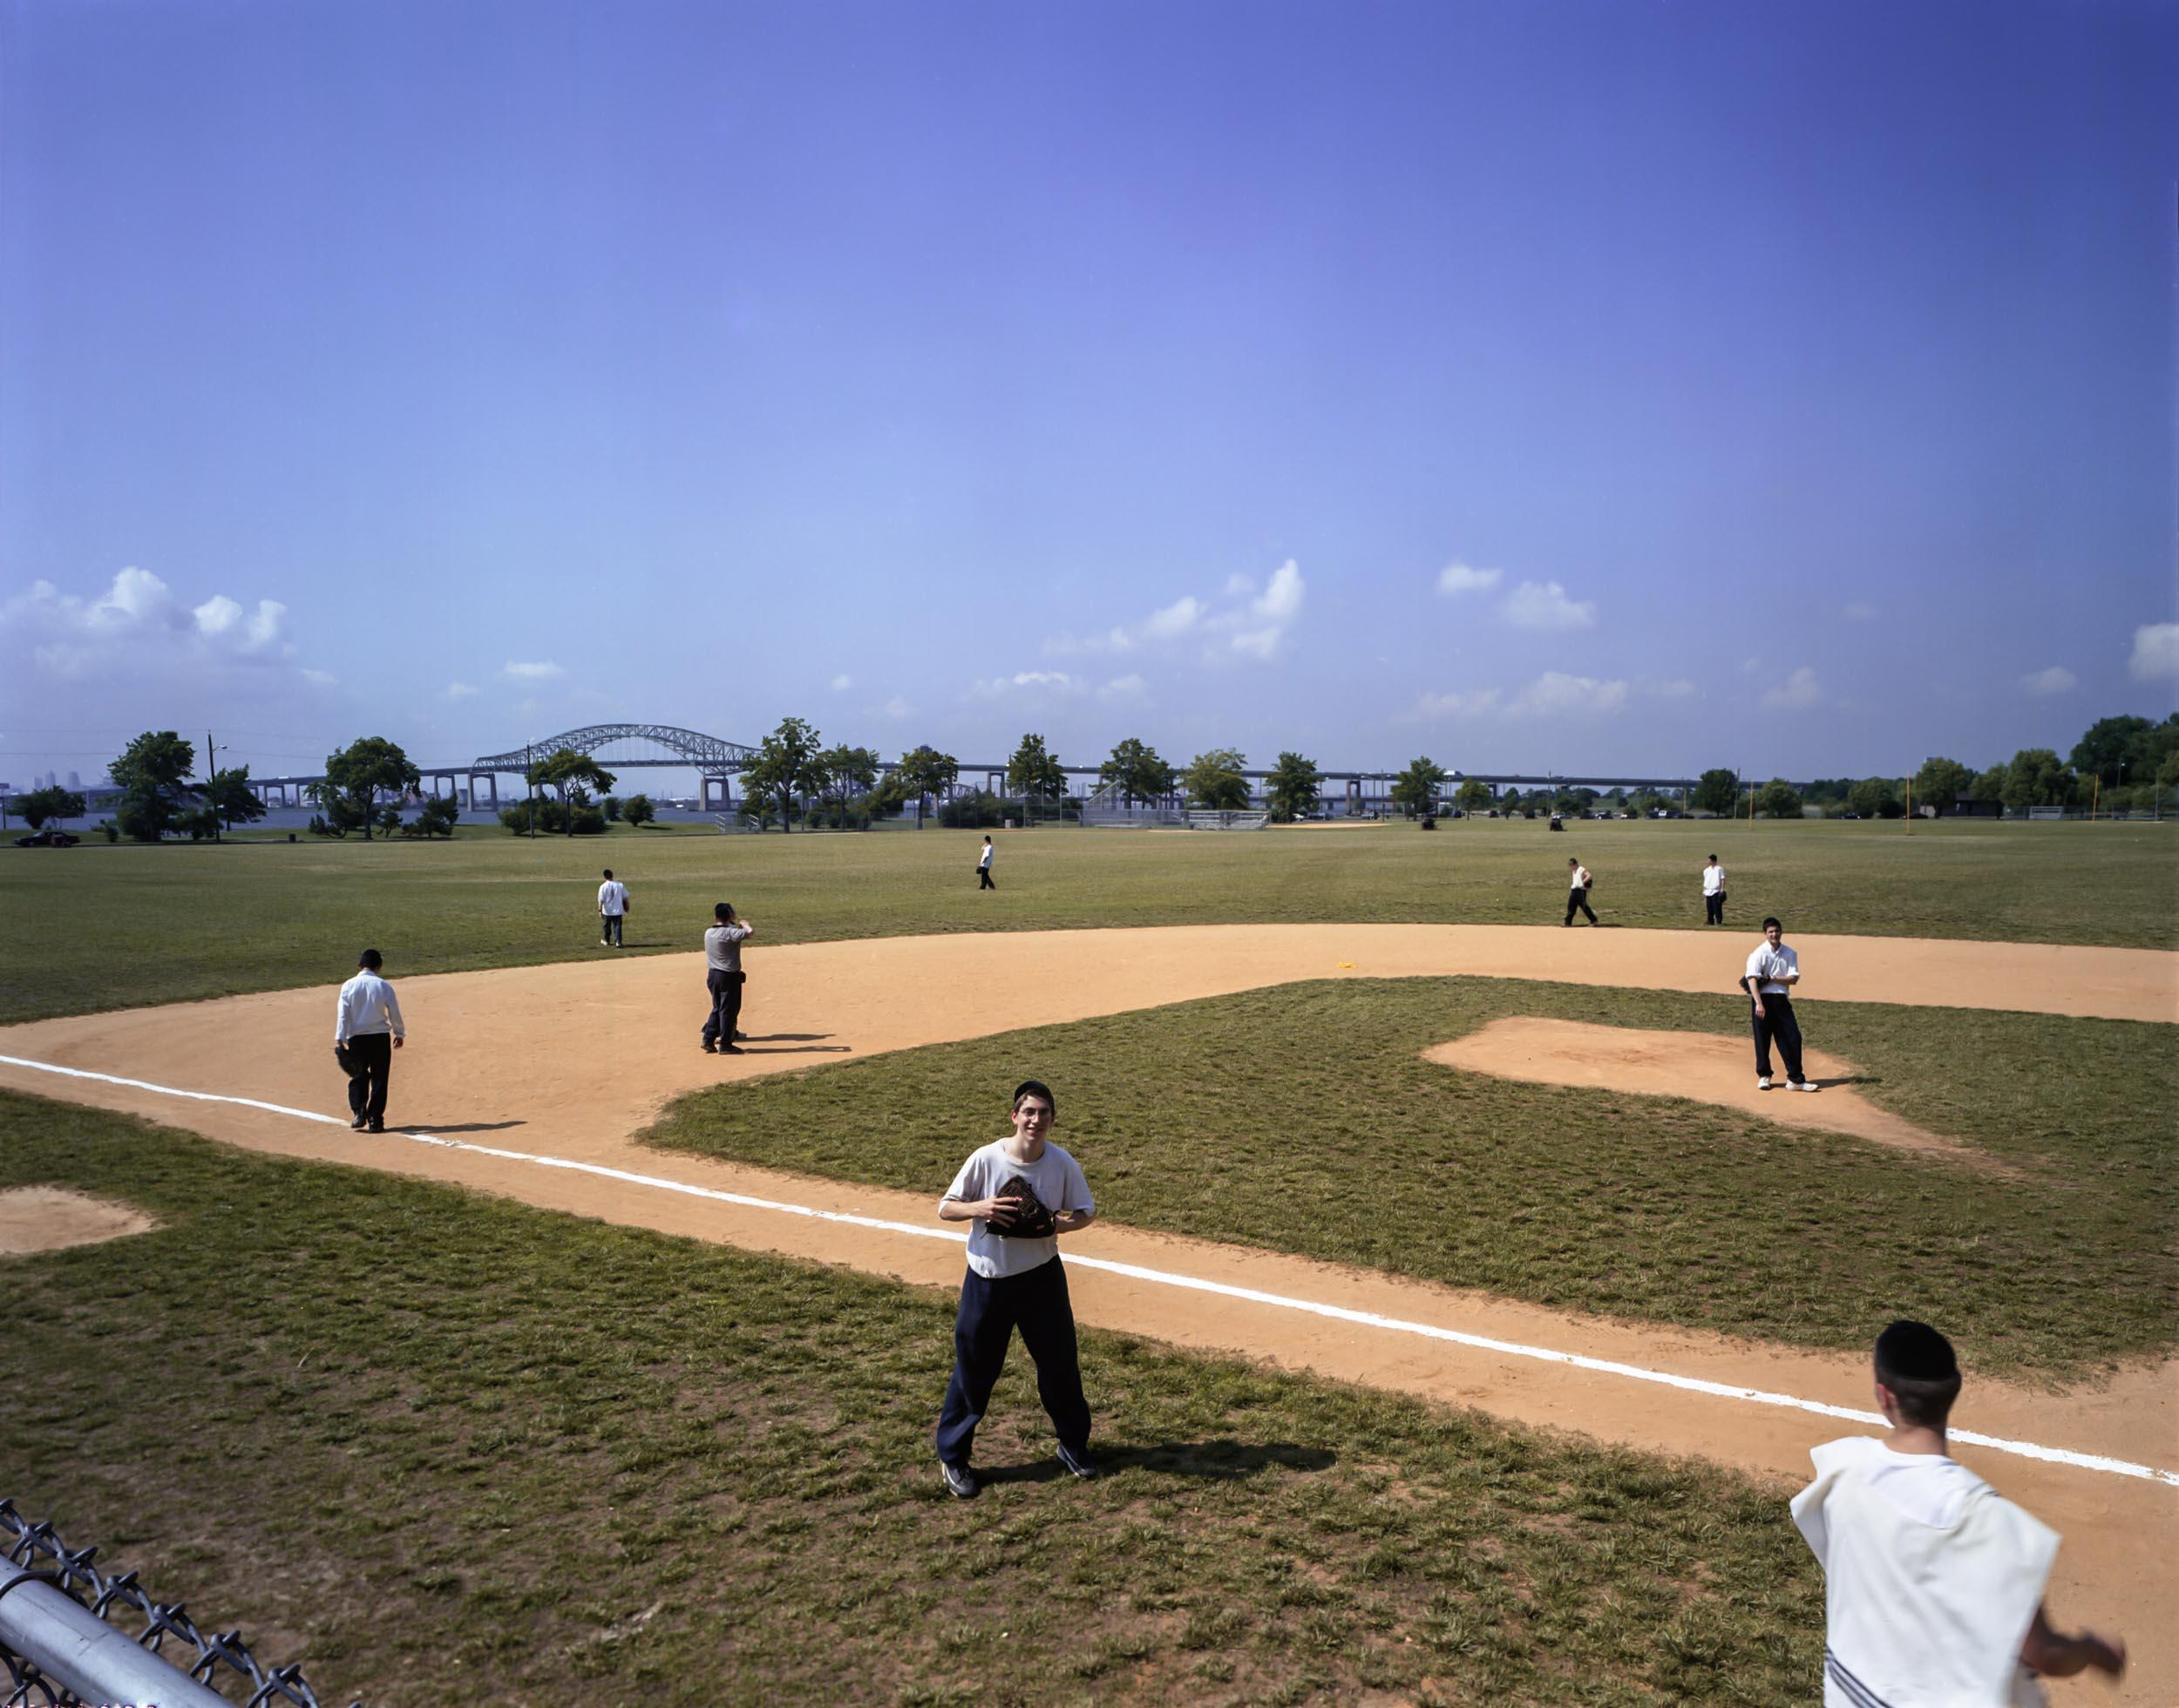 Hasidic_Baseball_001.1.jpg